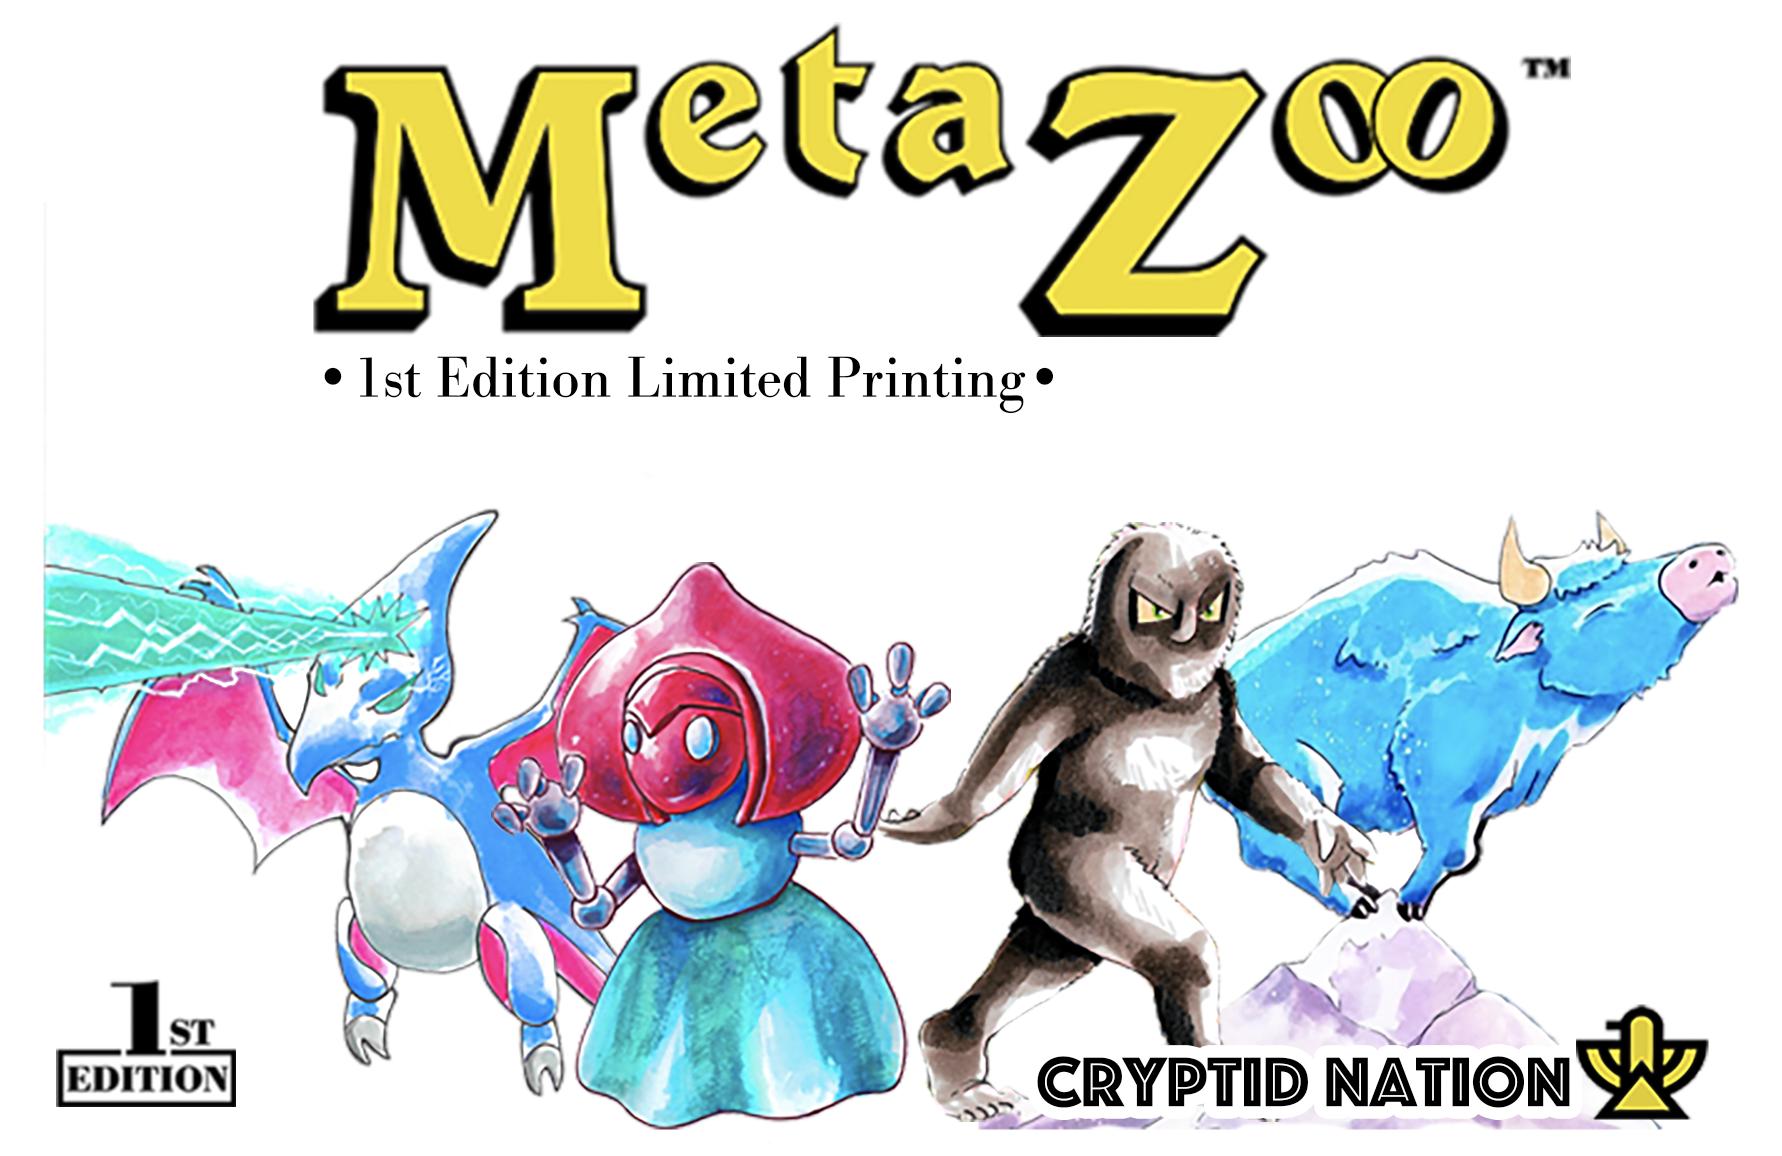 MetaZoo: Cryptid Nation